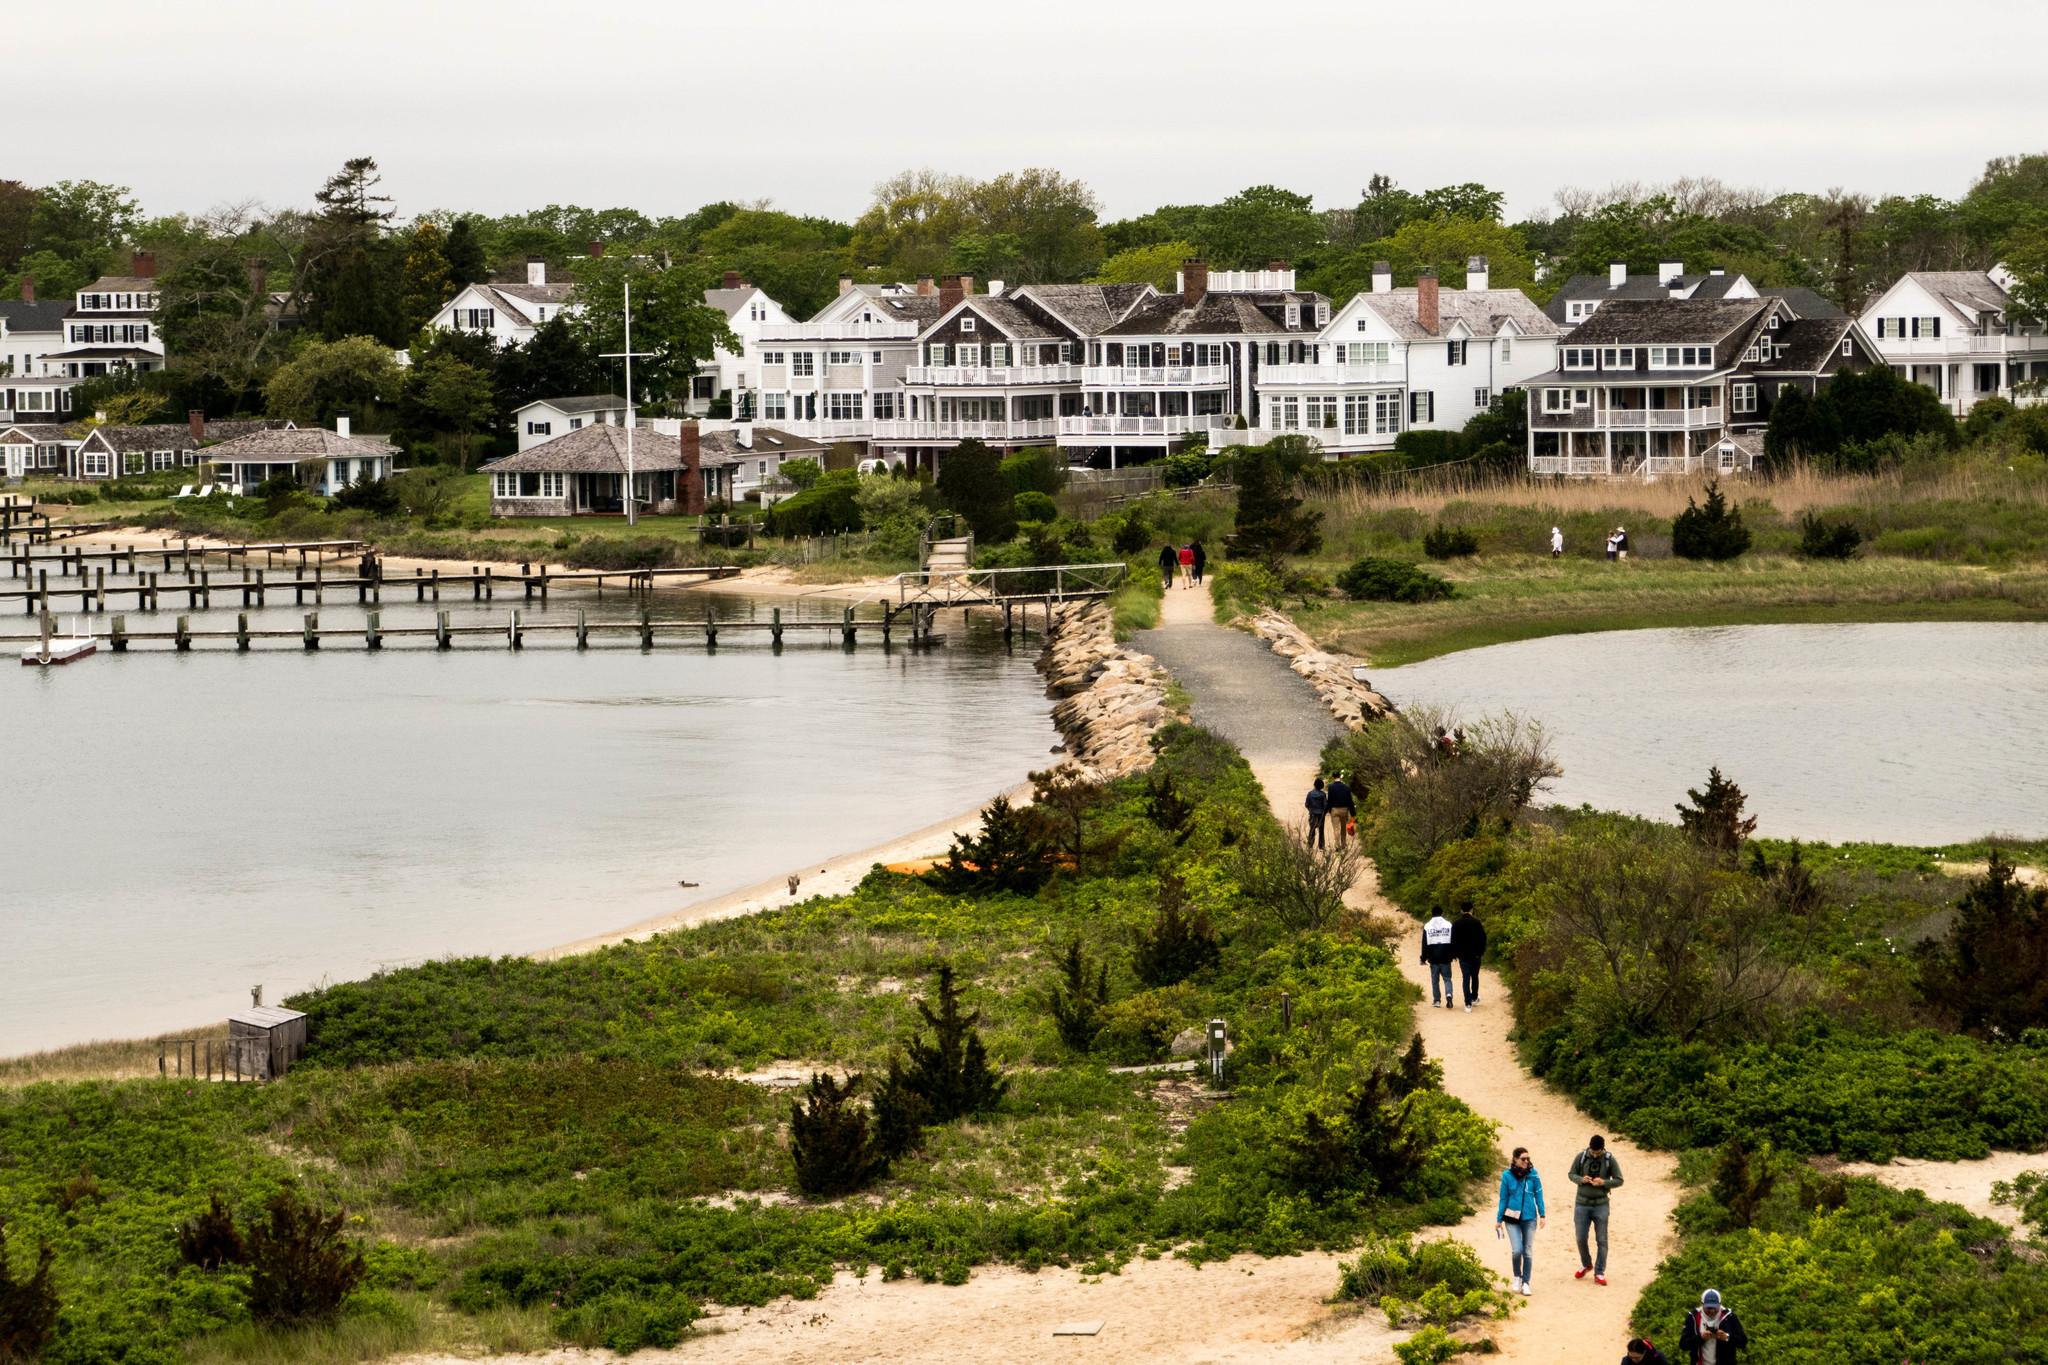 Barack and Michelle Obama drop almost $12 million on Martha's Vineyard beach estate: report